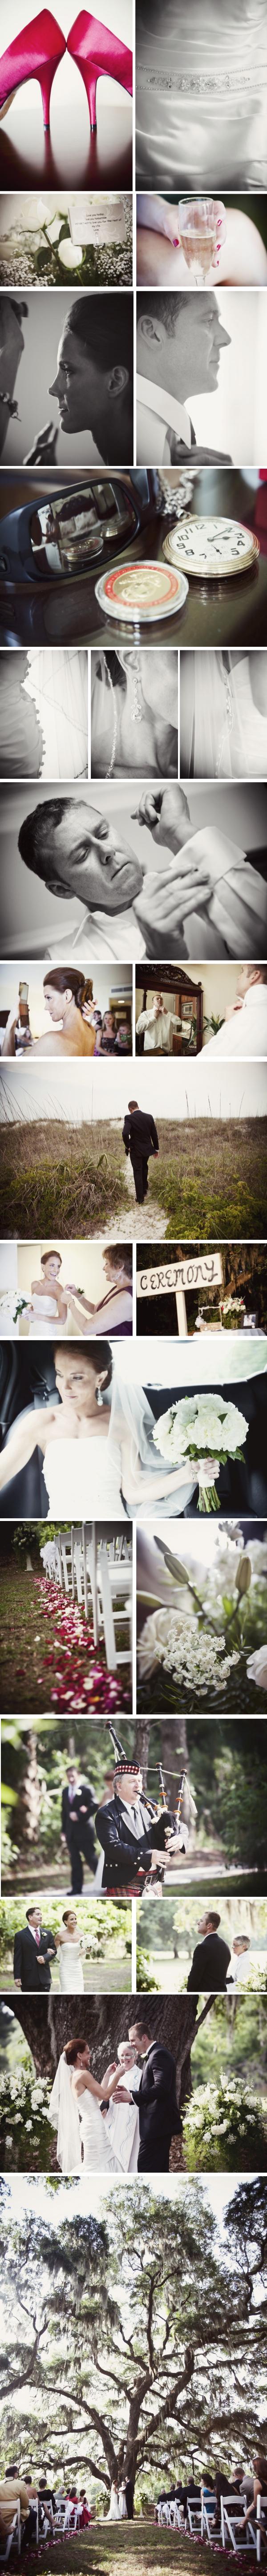 Southern Wedding | wedding blogs